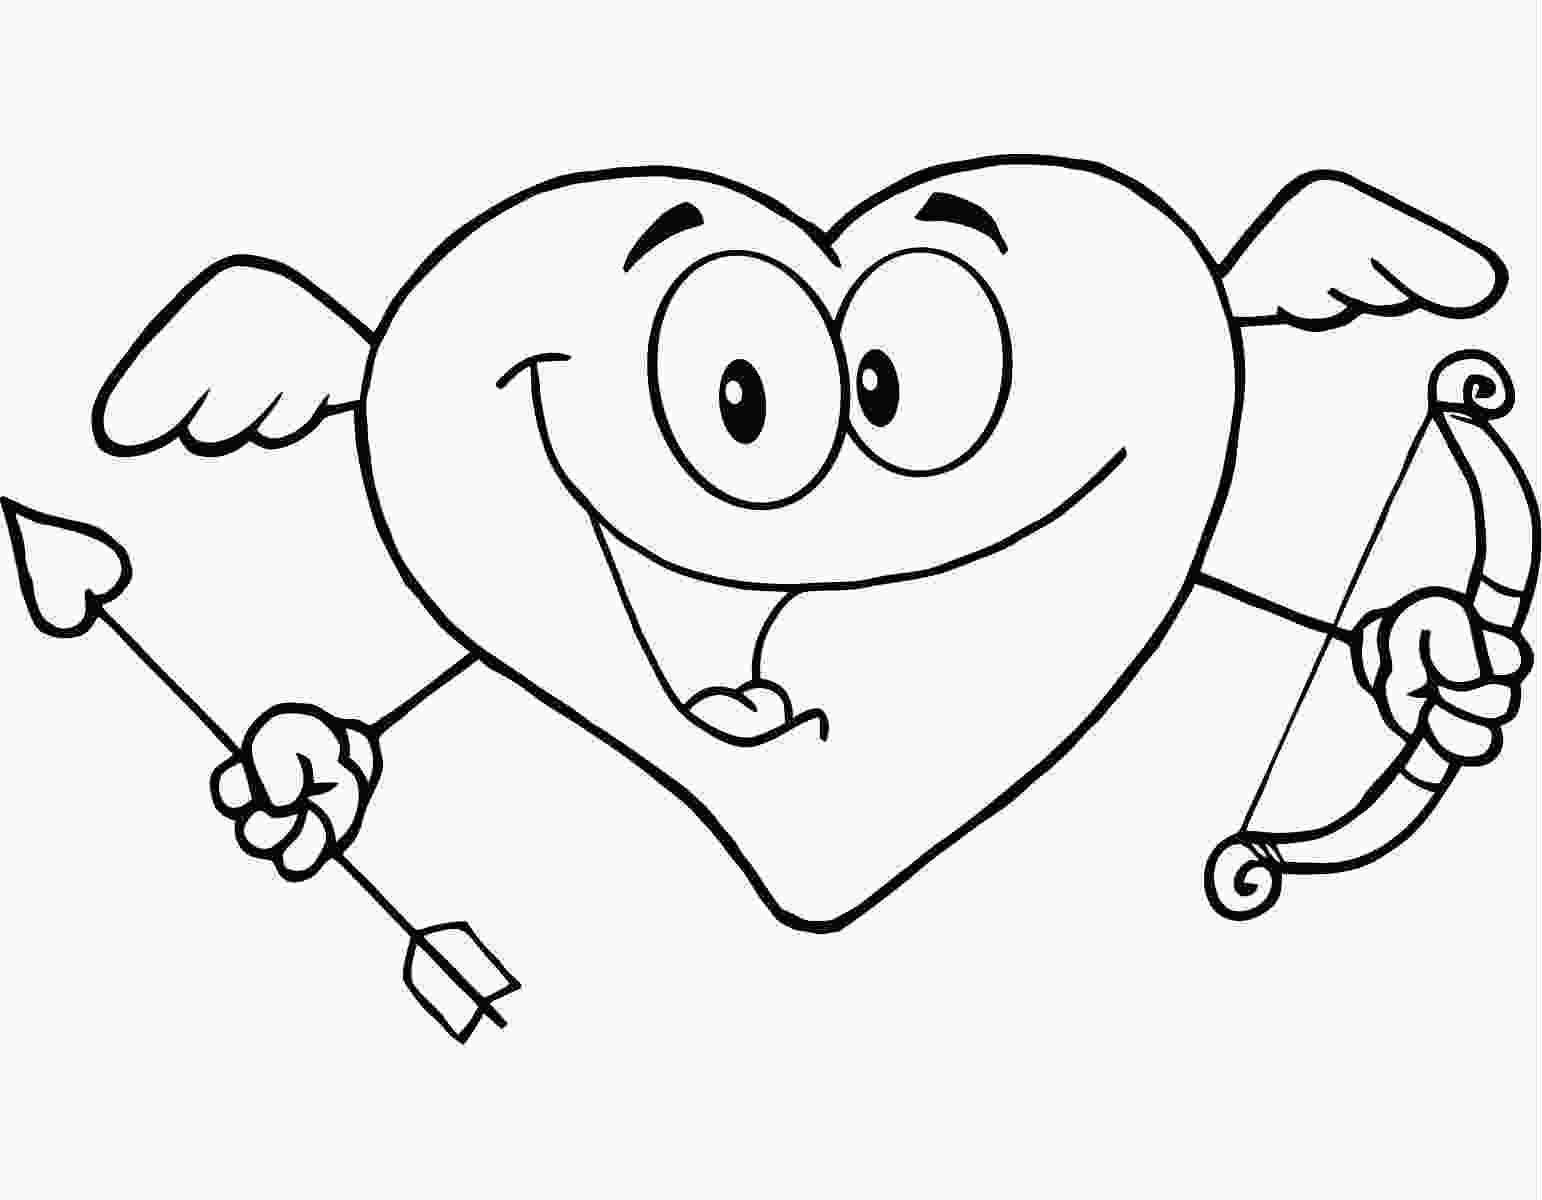 Dibujos de amor para colorear e imprimir gratis